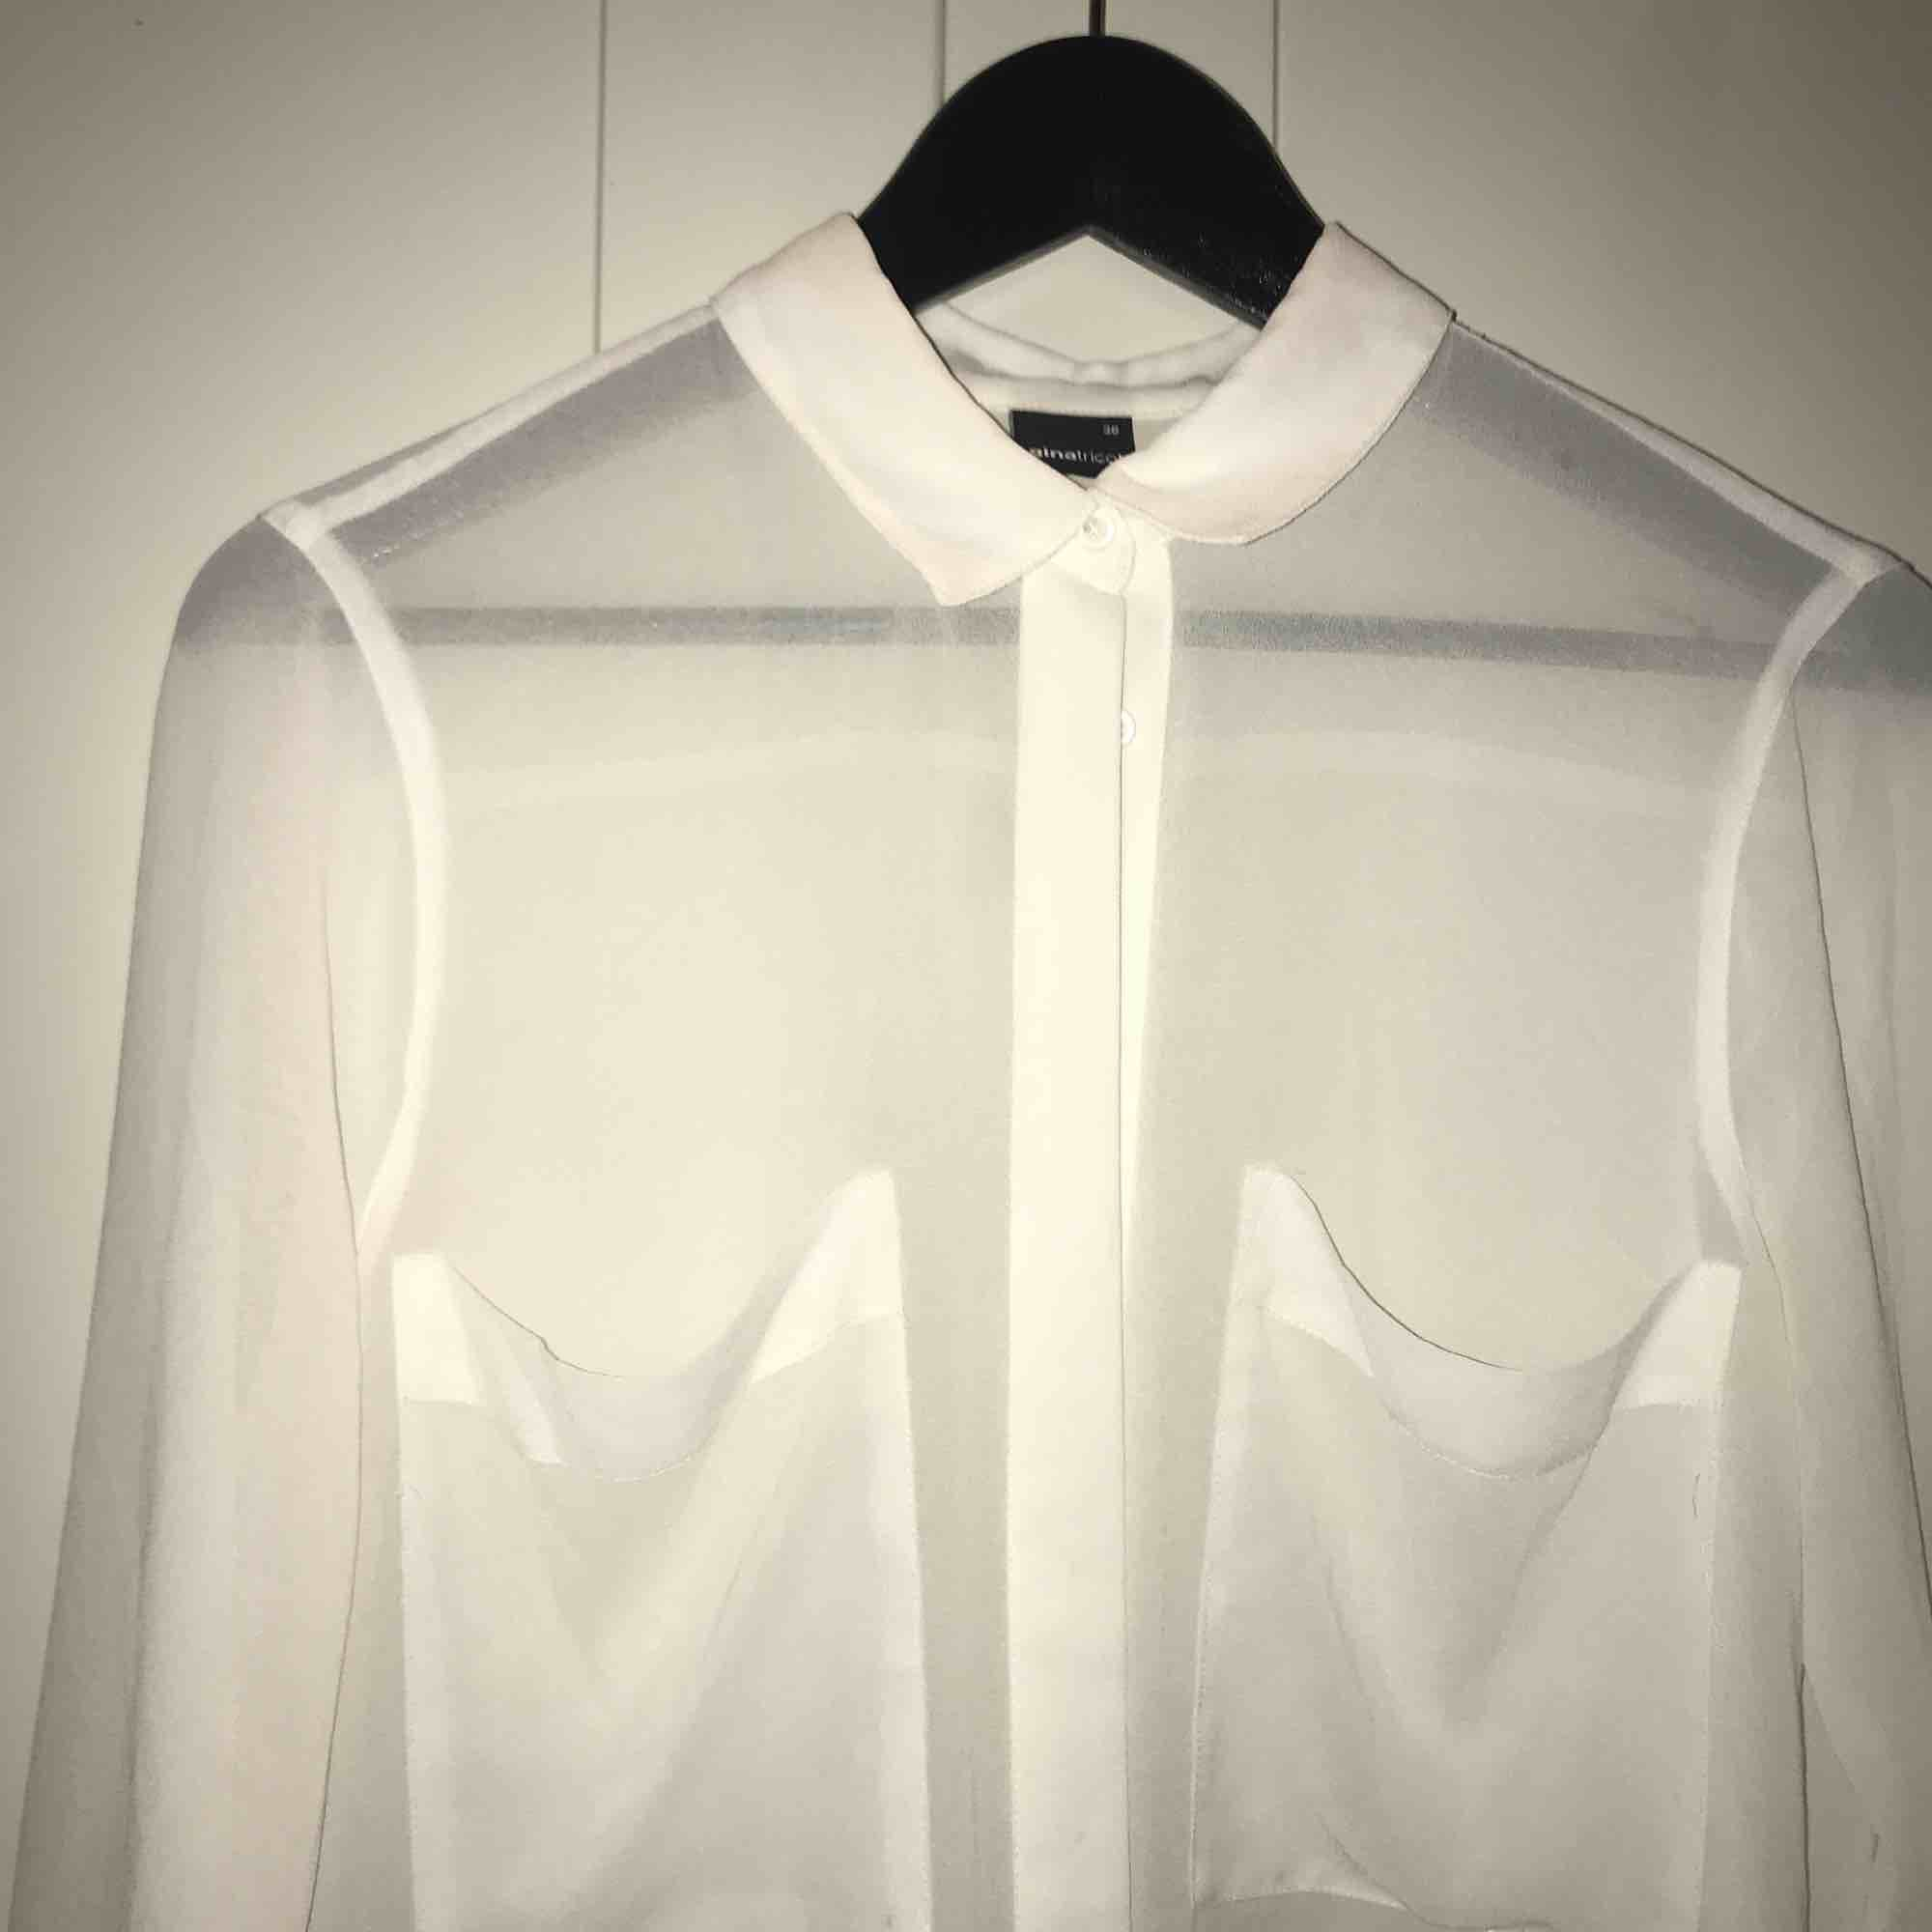 Vit transparent skjorta i stl. 36 från Gina Tricot . Skjortor.